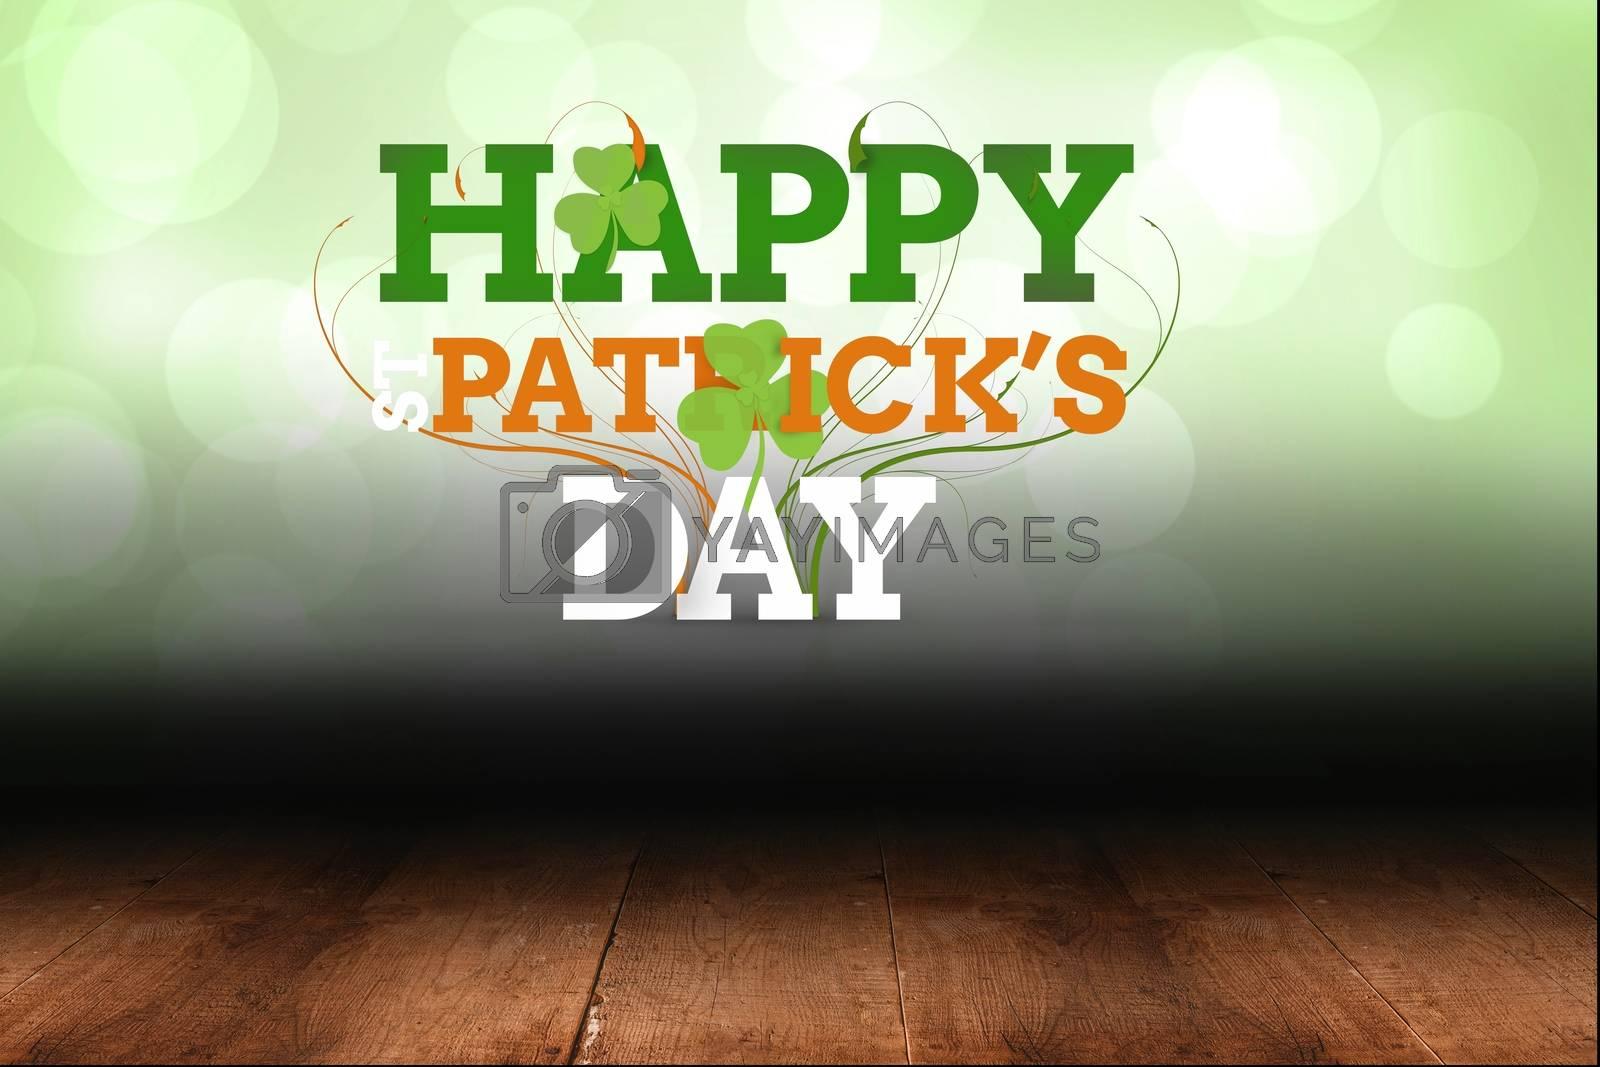 Text of happy st patricks day